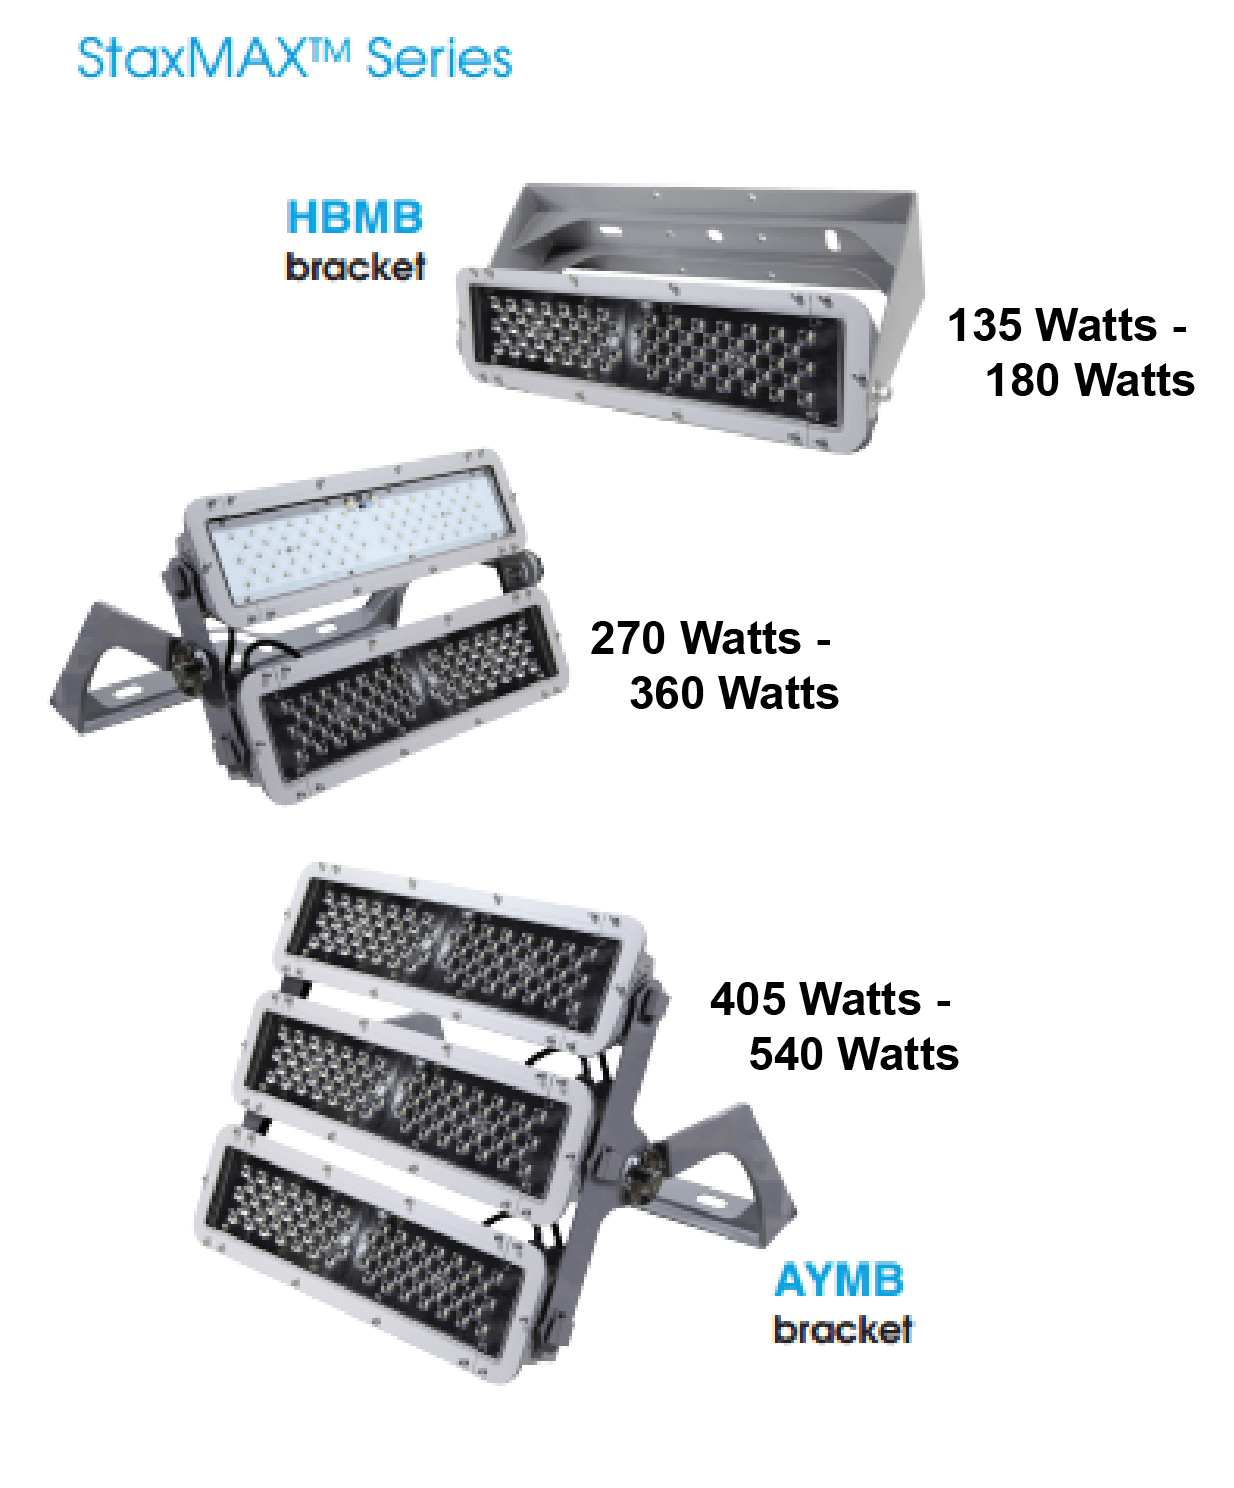 Maxlite Ellf135un50 Staxmax Series